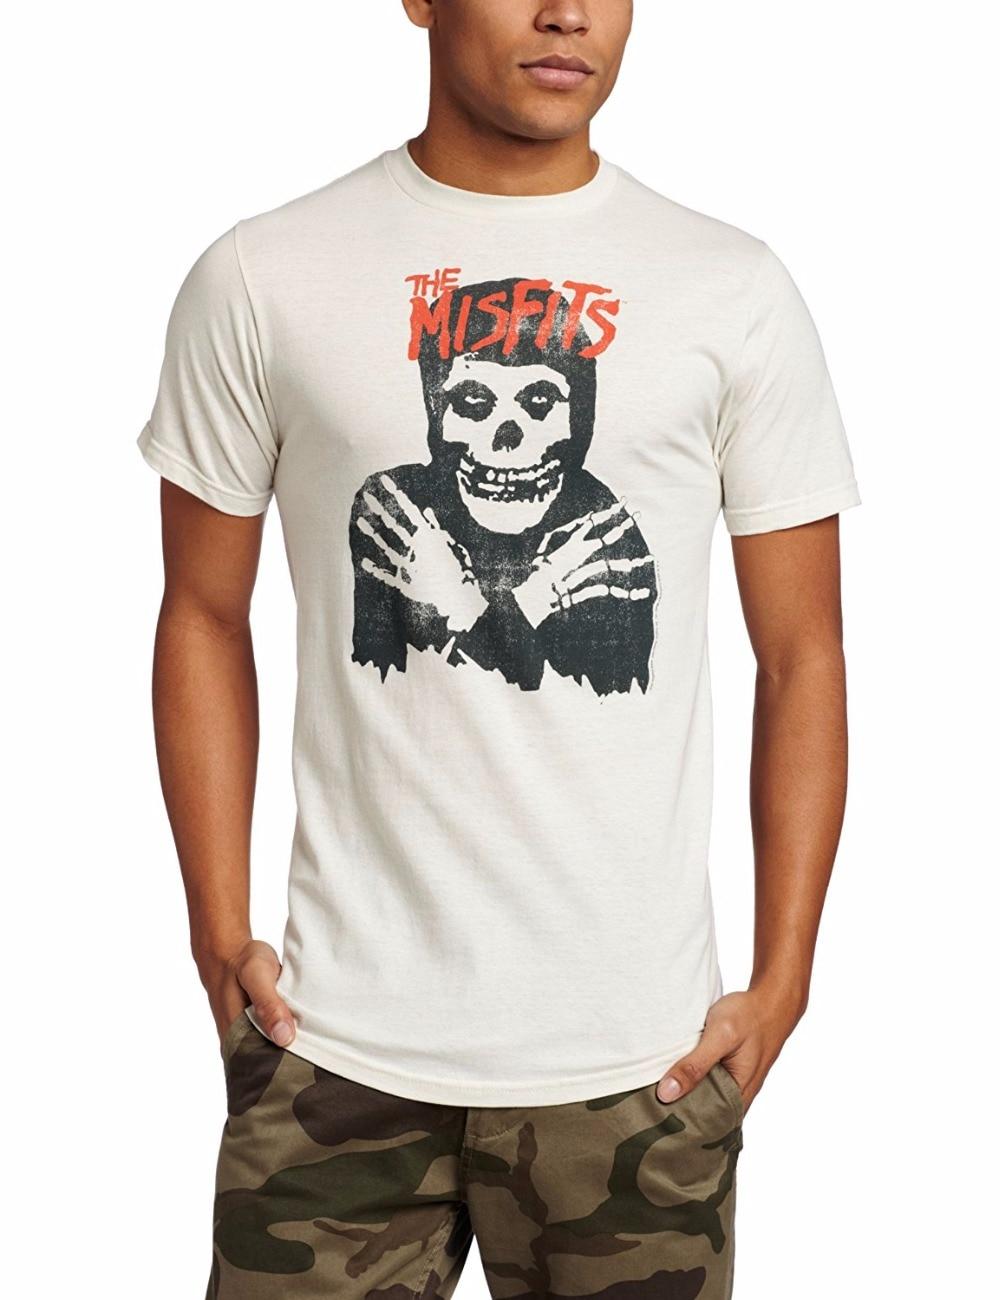 Casual Shirt Tee Short Sleeve Printed O-Neck Mens Merchandising Mens Misfits Classic Skull T-Shirt Tee